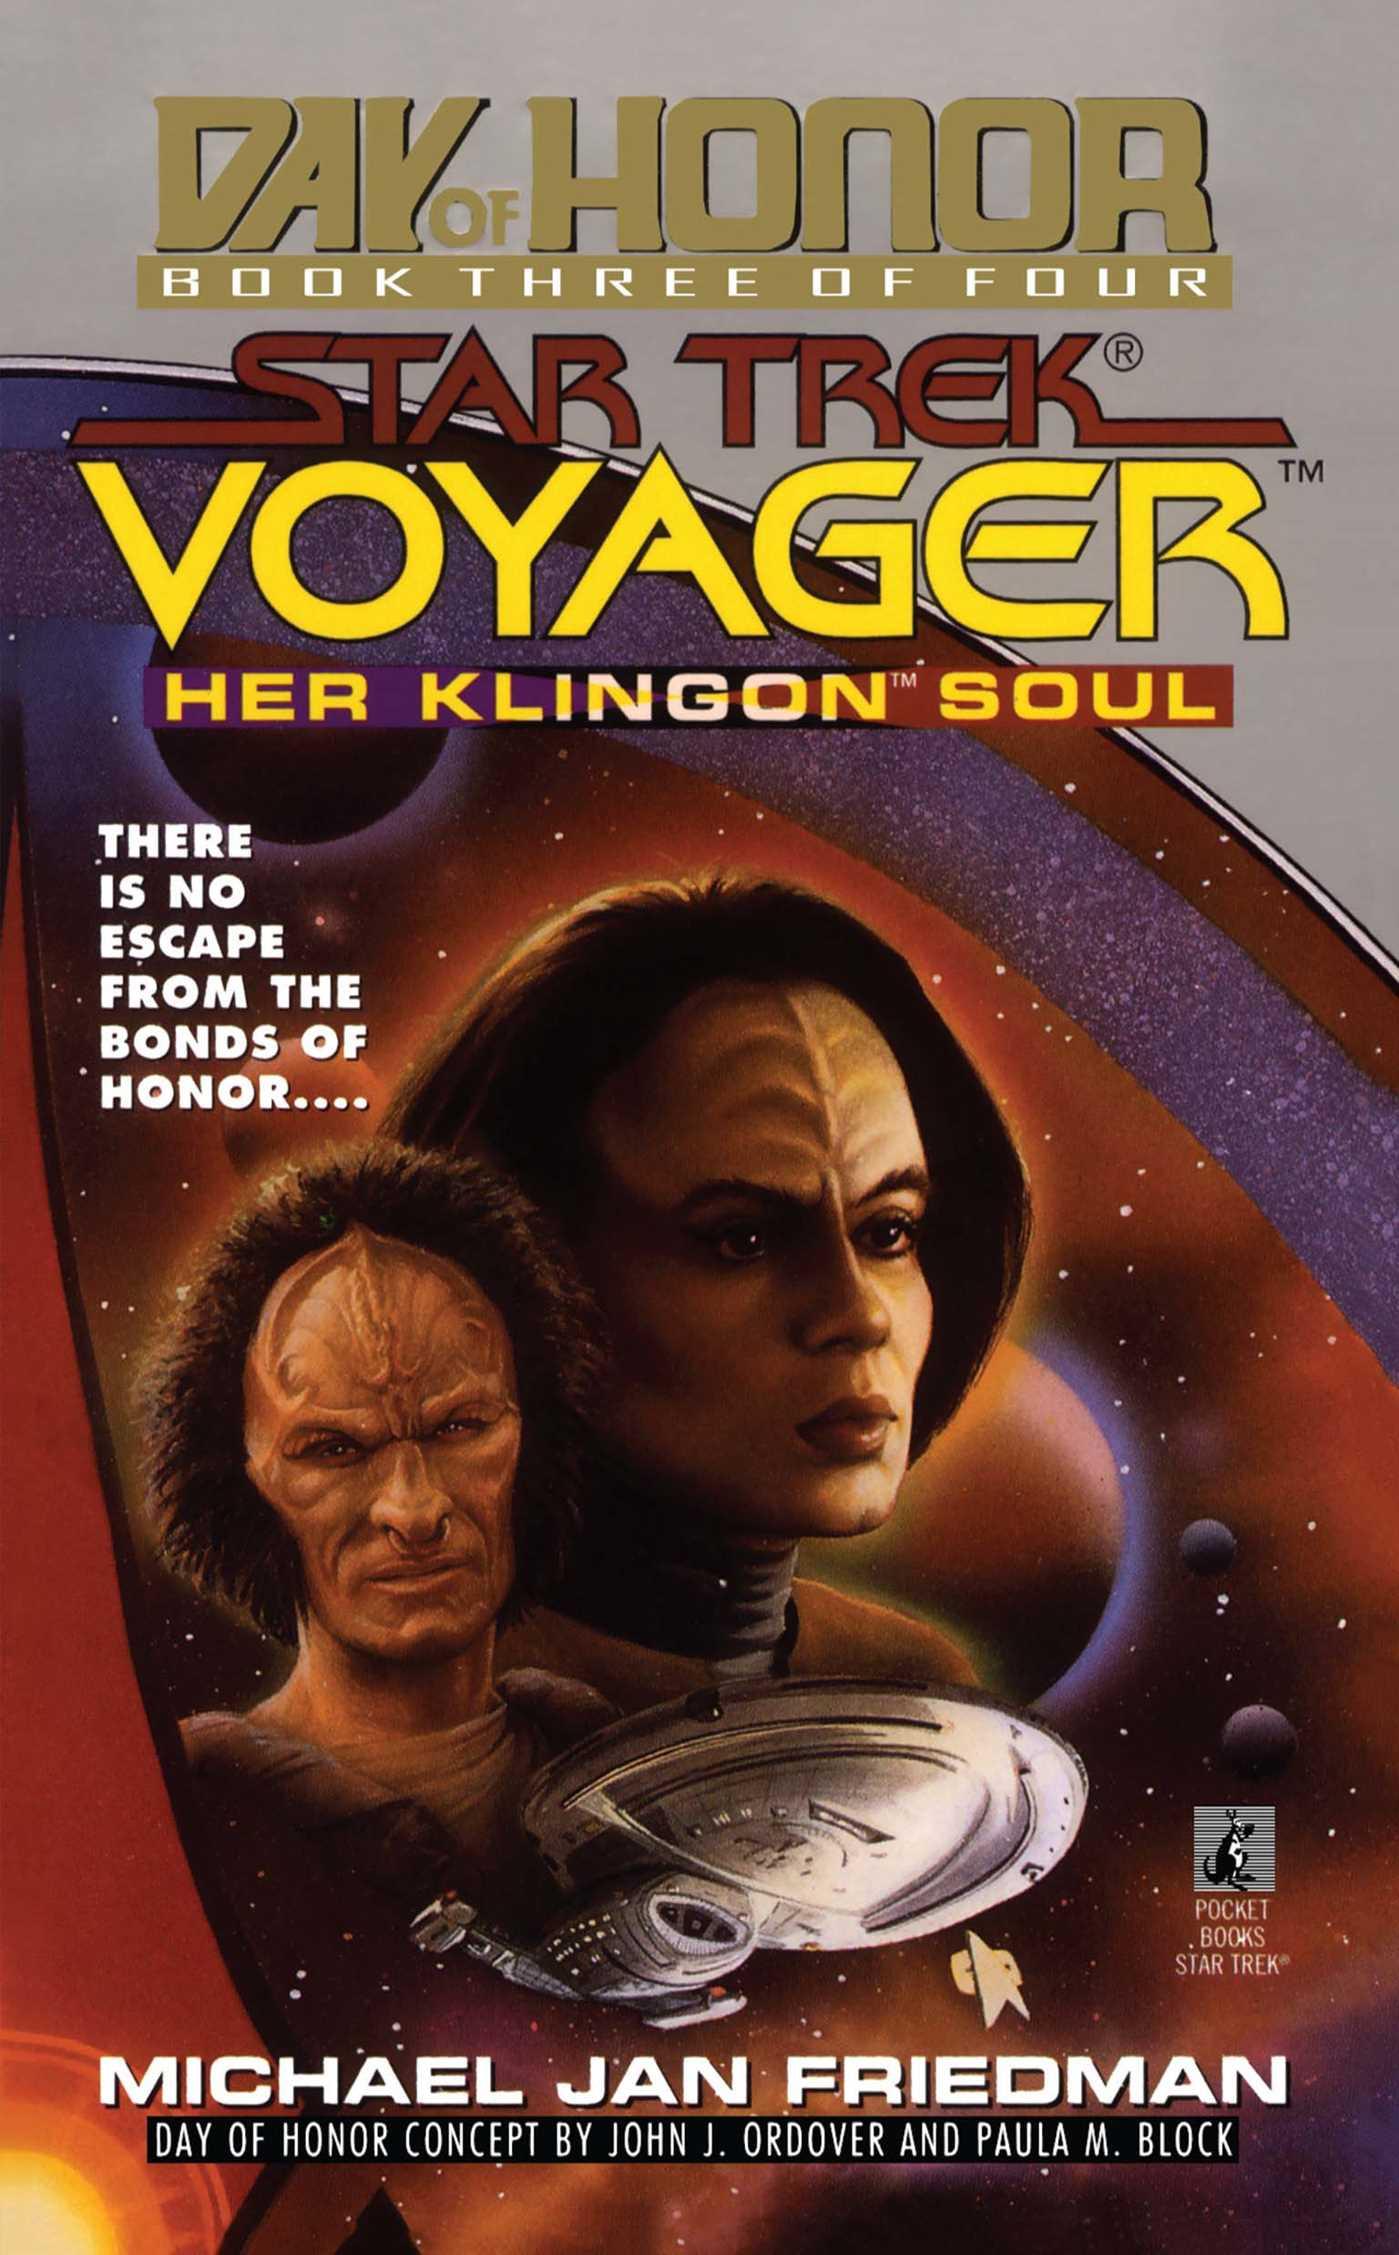 Her klingon soul 9780743455886 hr